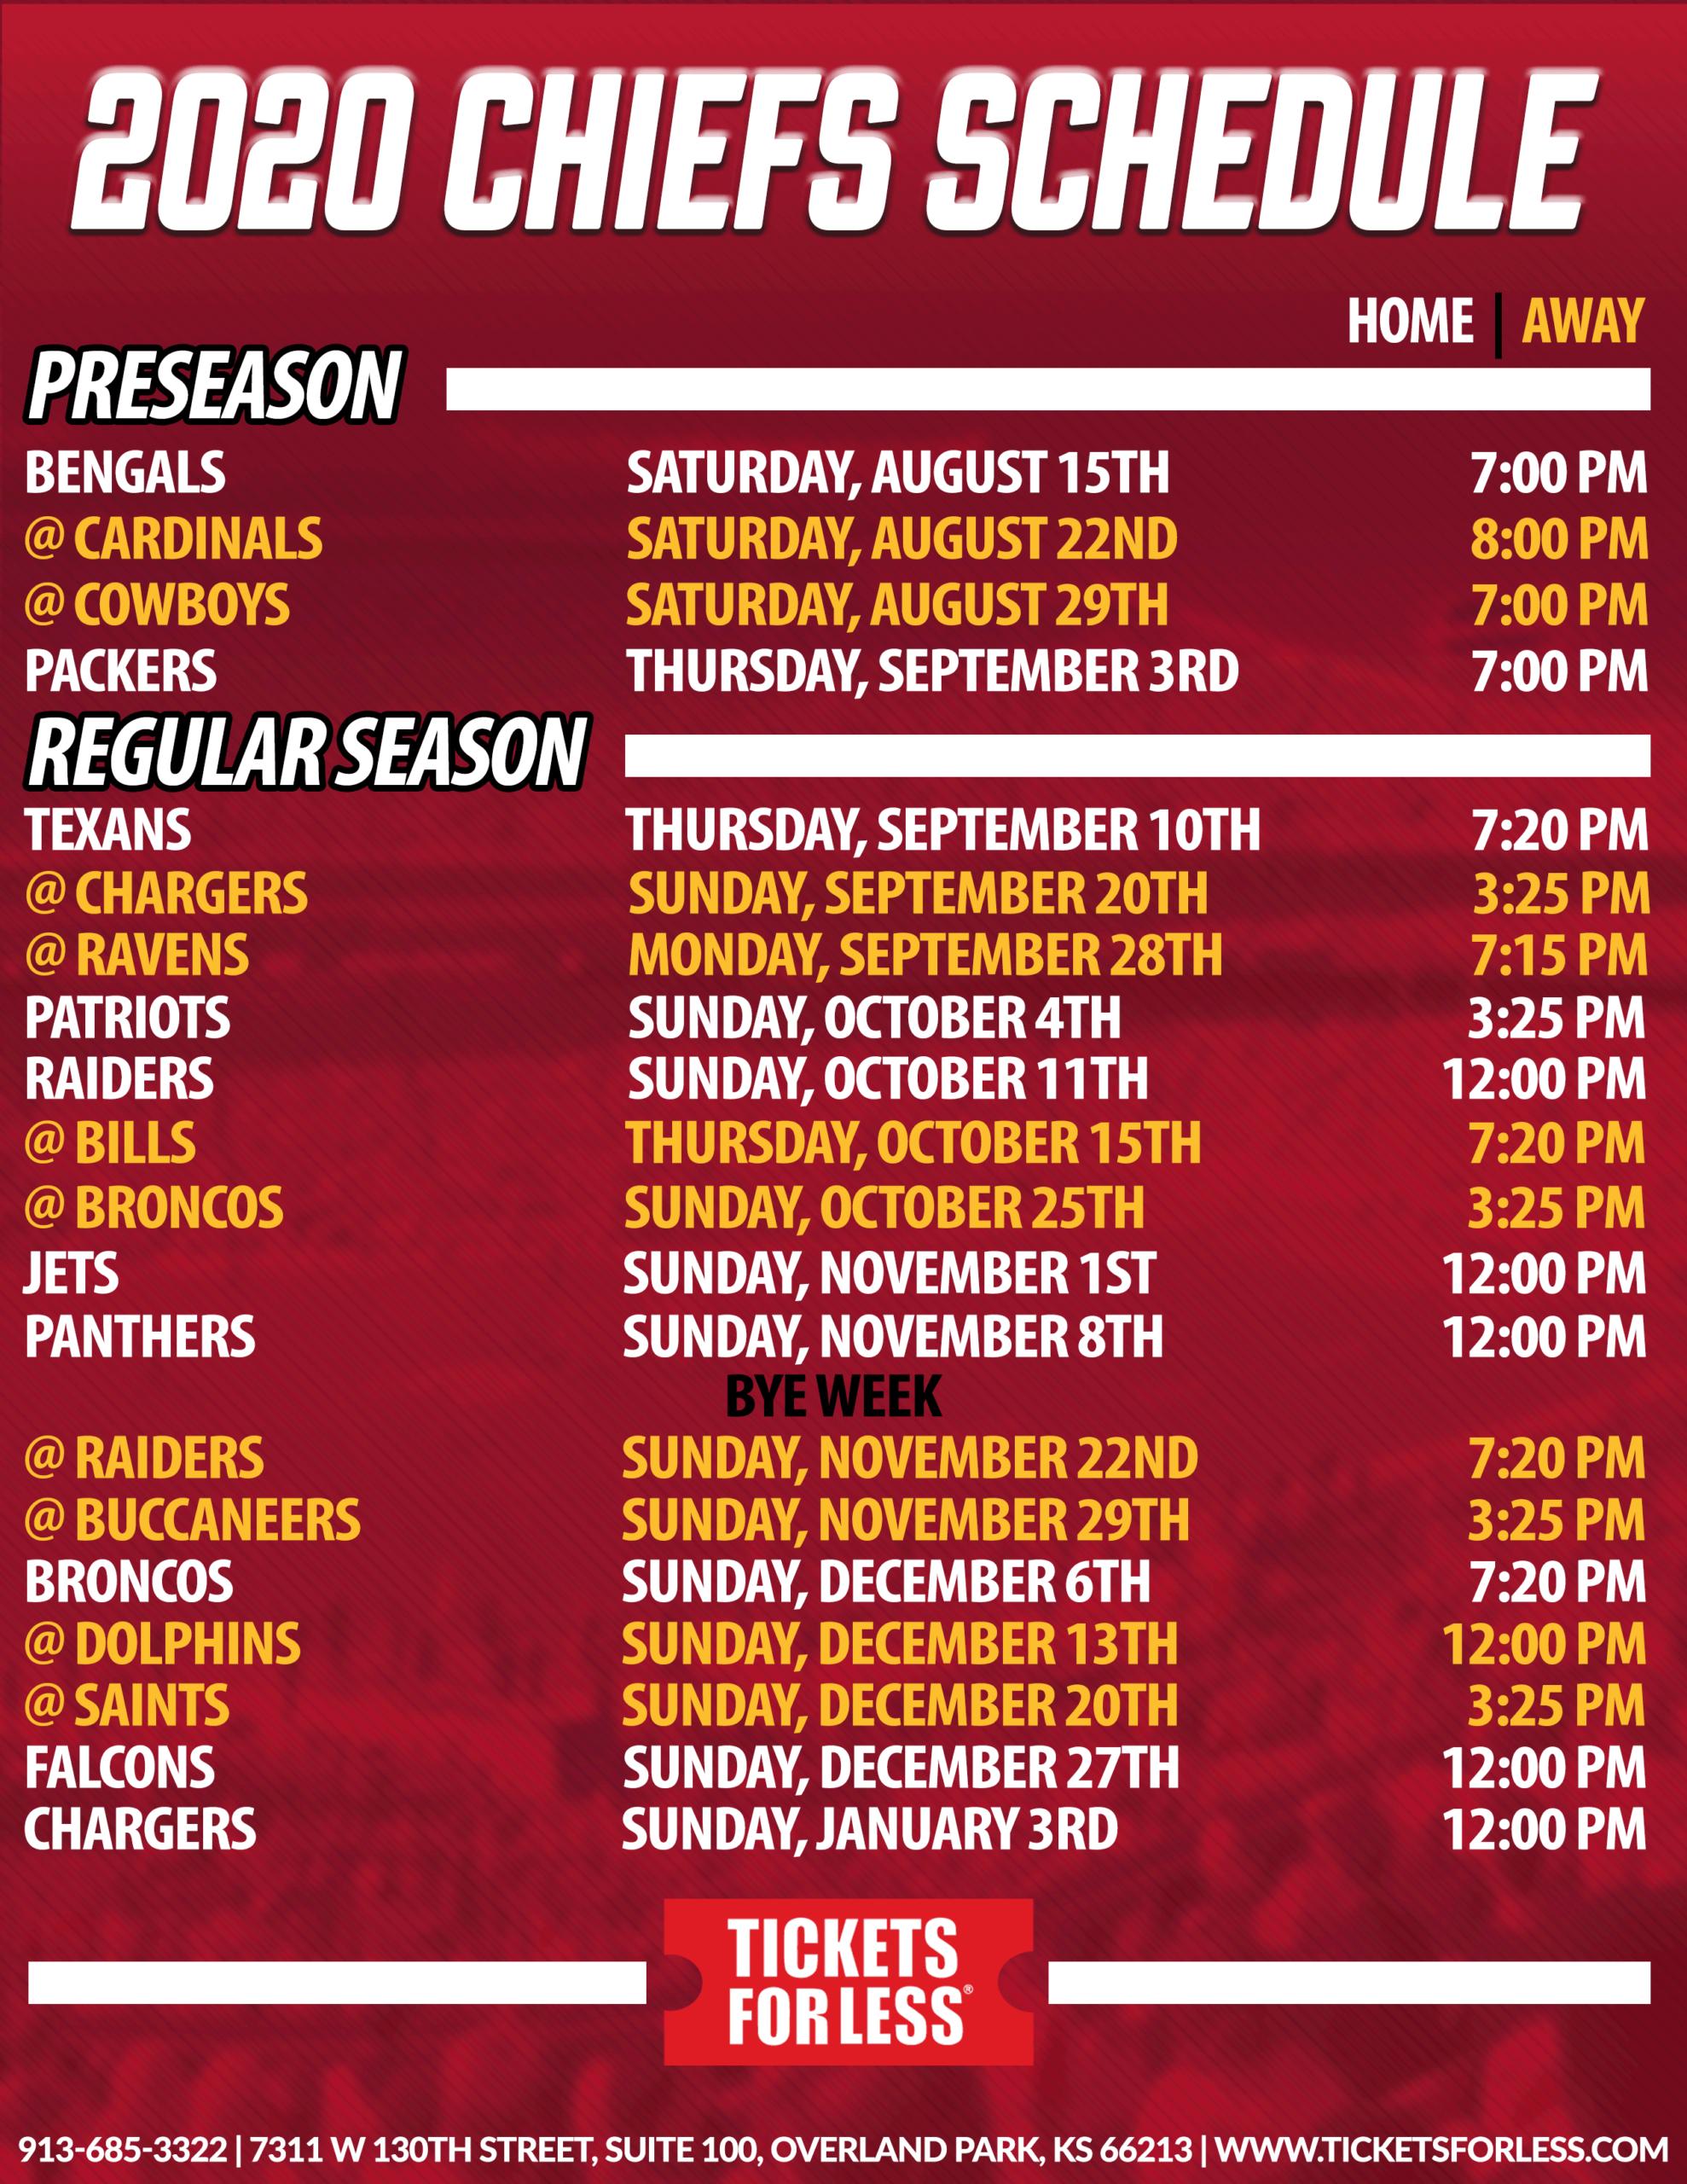 Chiefs Printable Schedule - Kansas City Chiefs Schedule throughout Printable Nfl Schedule 2021 Season